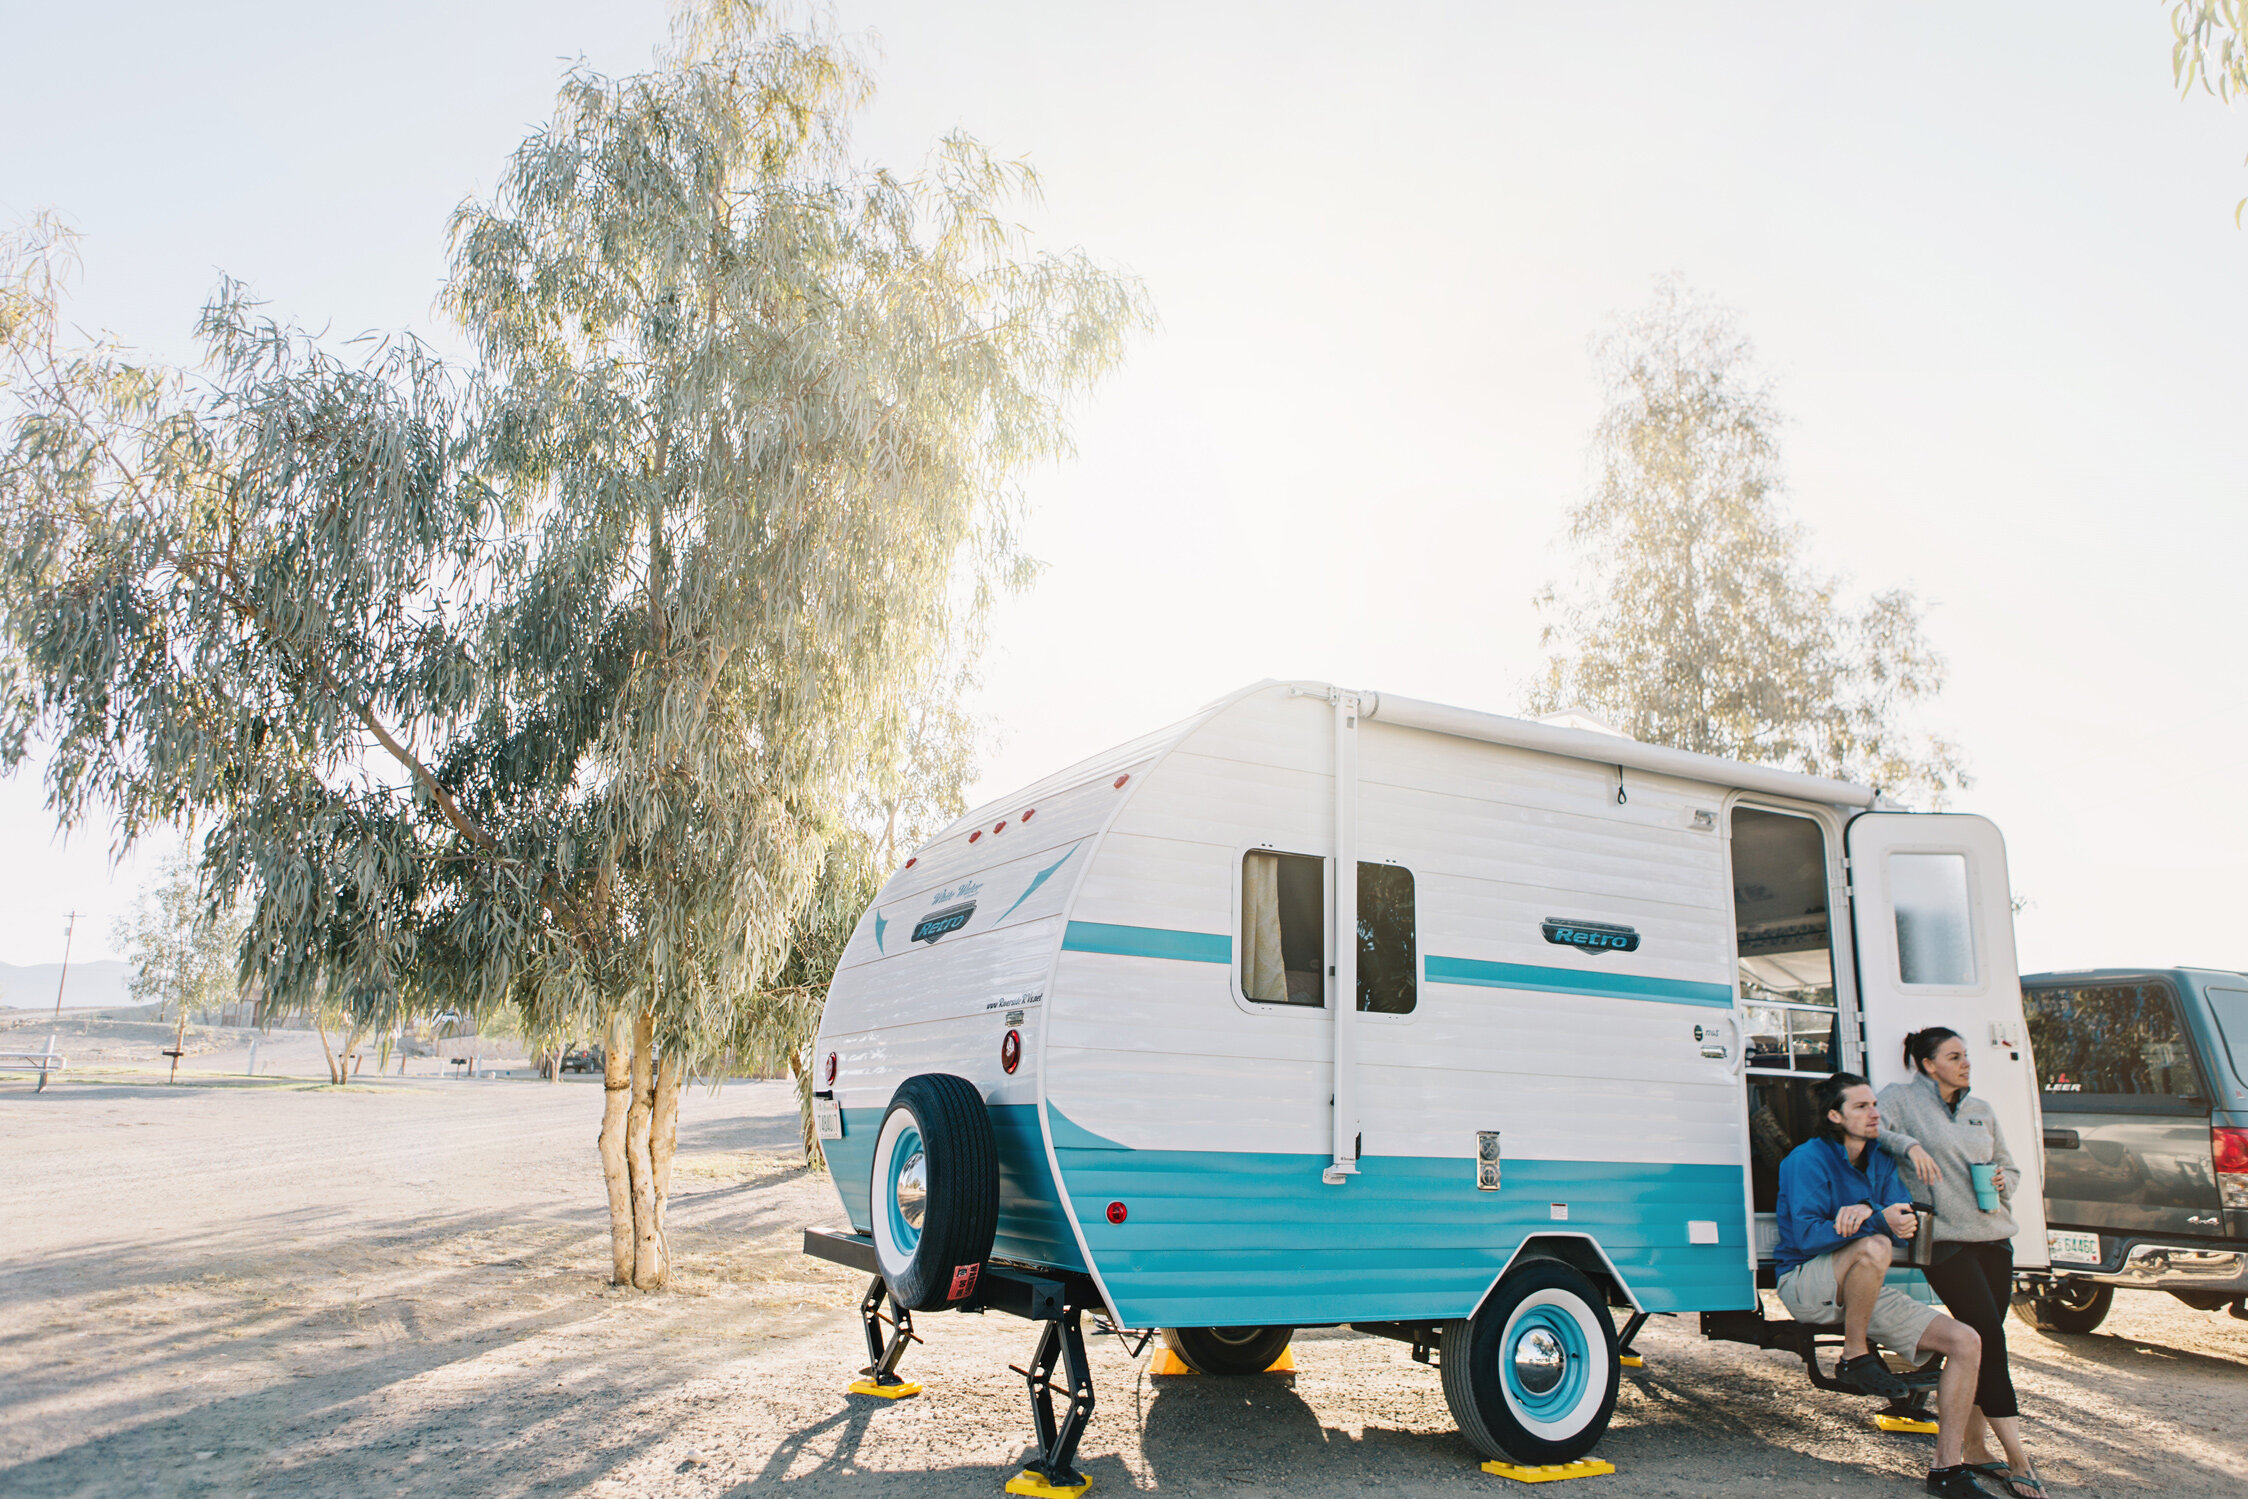 CindyGiovagnoli_Road_Trip_Travel_National_Parks_Explore_America-002.jpg